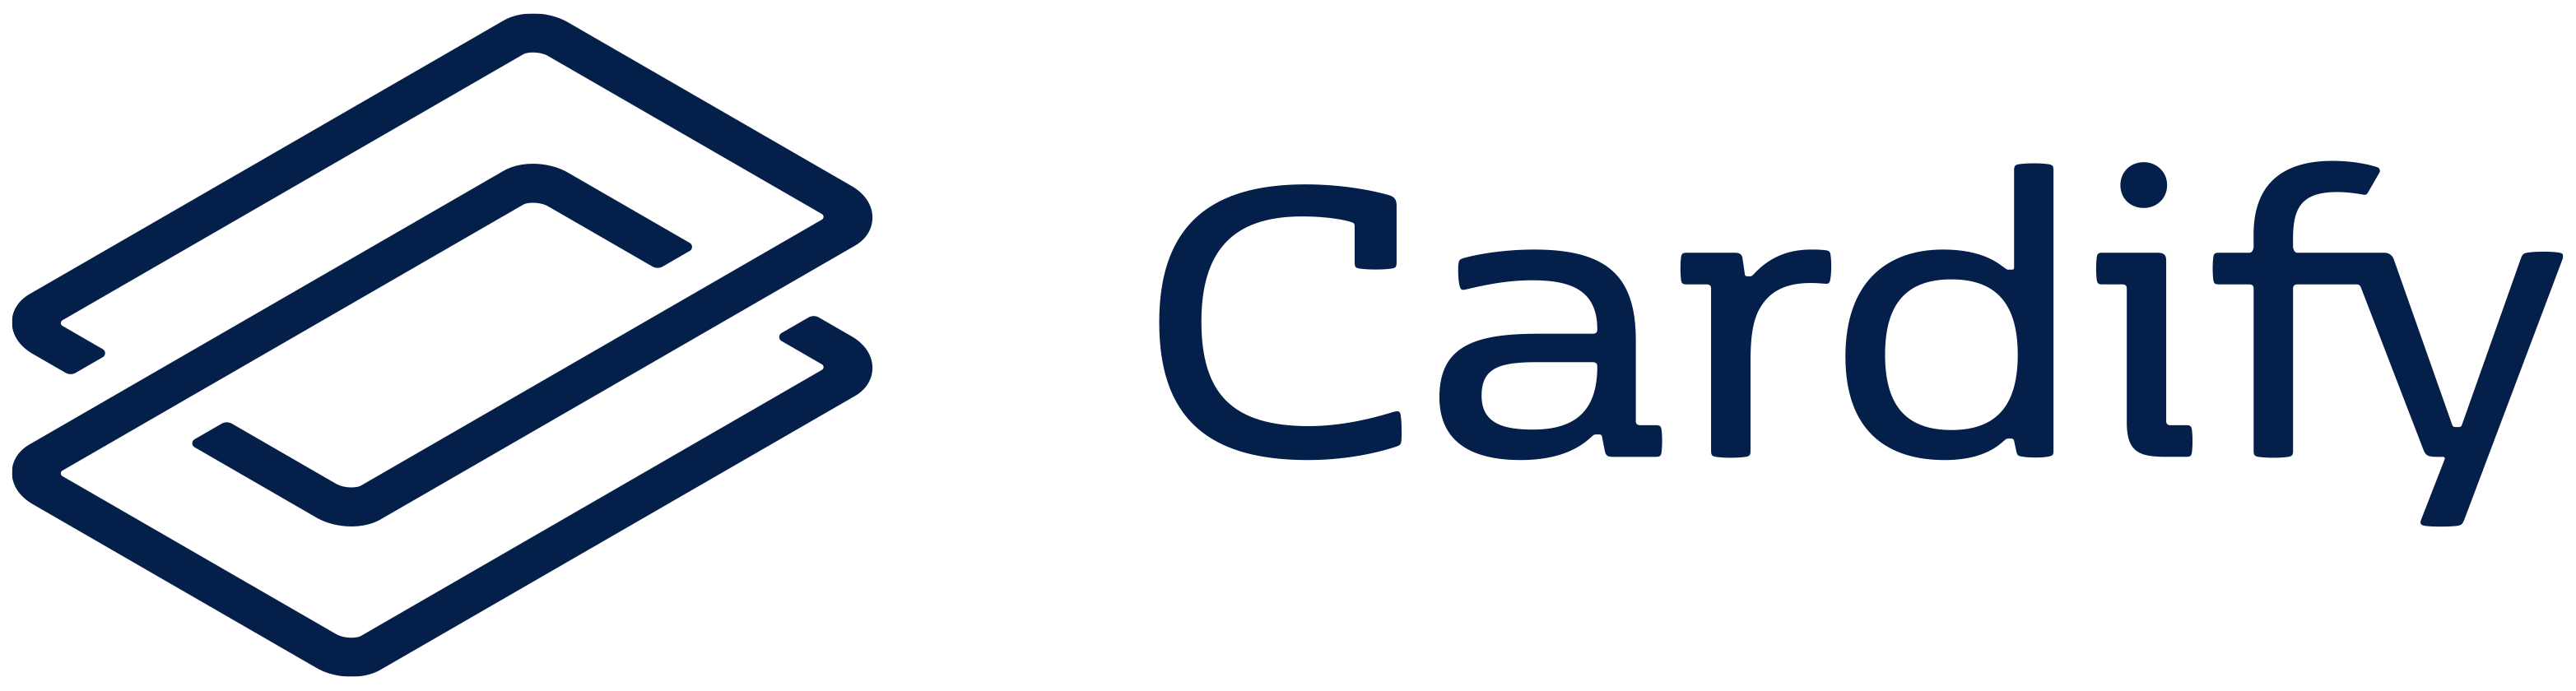 Cardify logo